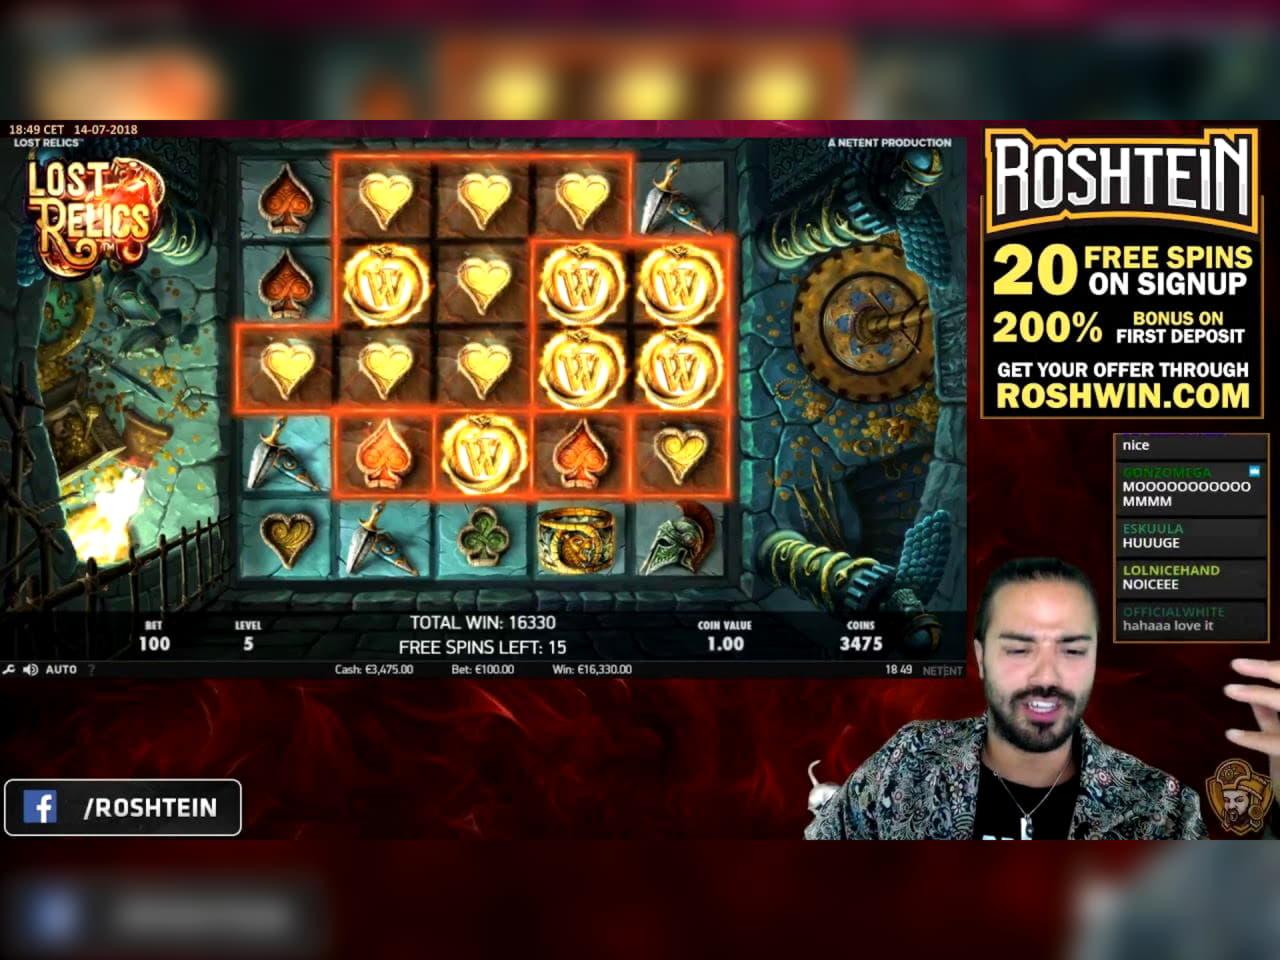 375% casino match bonus at 888 Casino